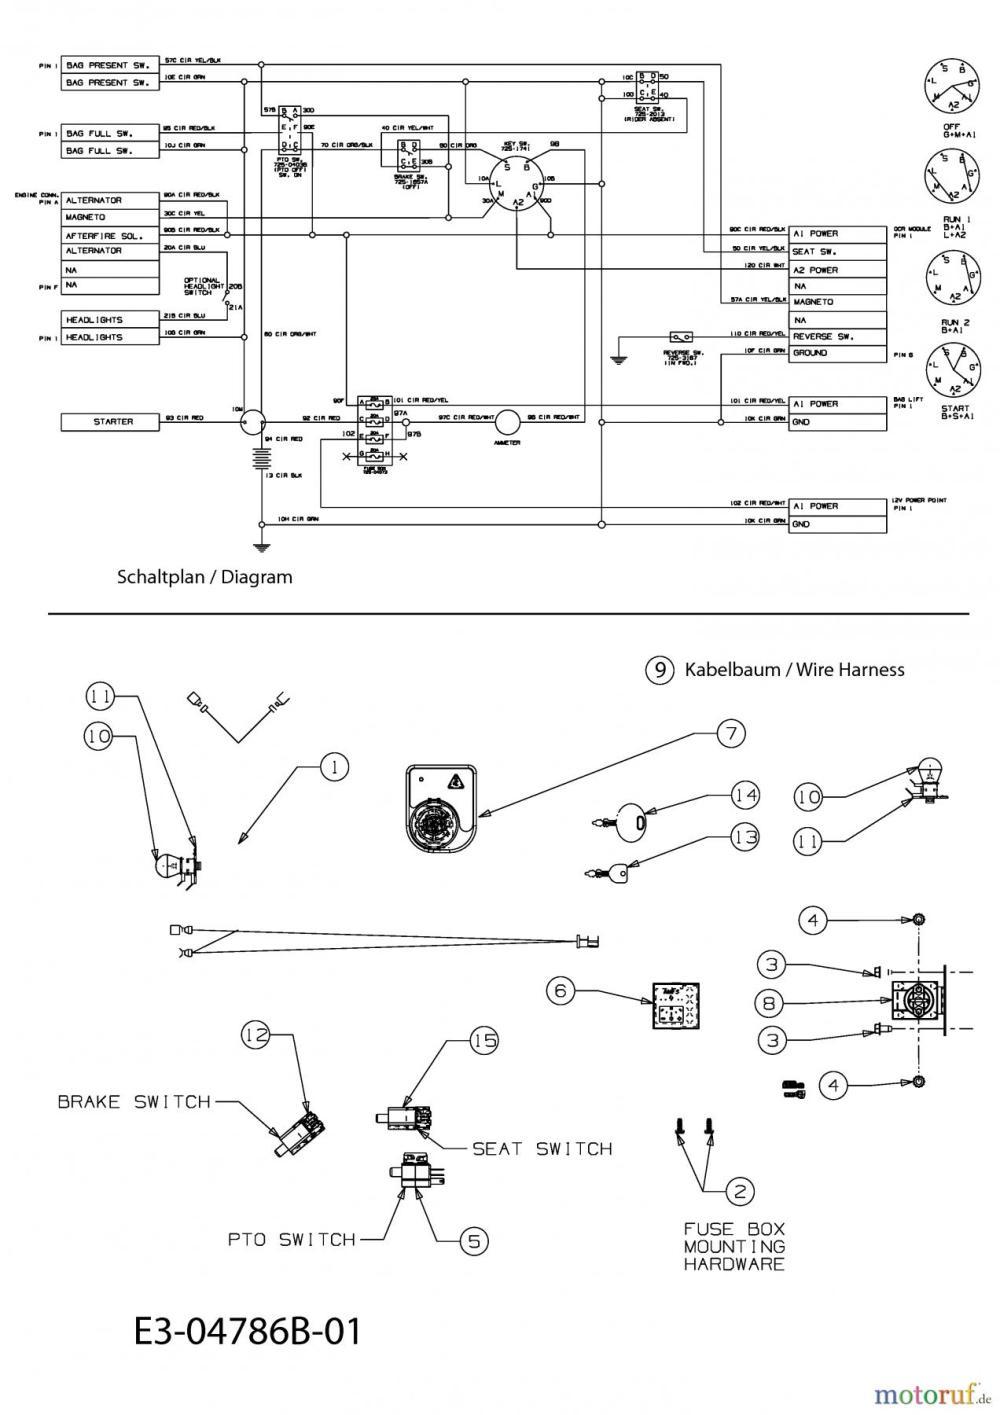 medium resolution of ranch king lawn mower belt diagram ranch free engine craftsman riding mower wiring diagram ariens riding mower wiring diagram